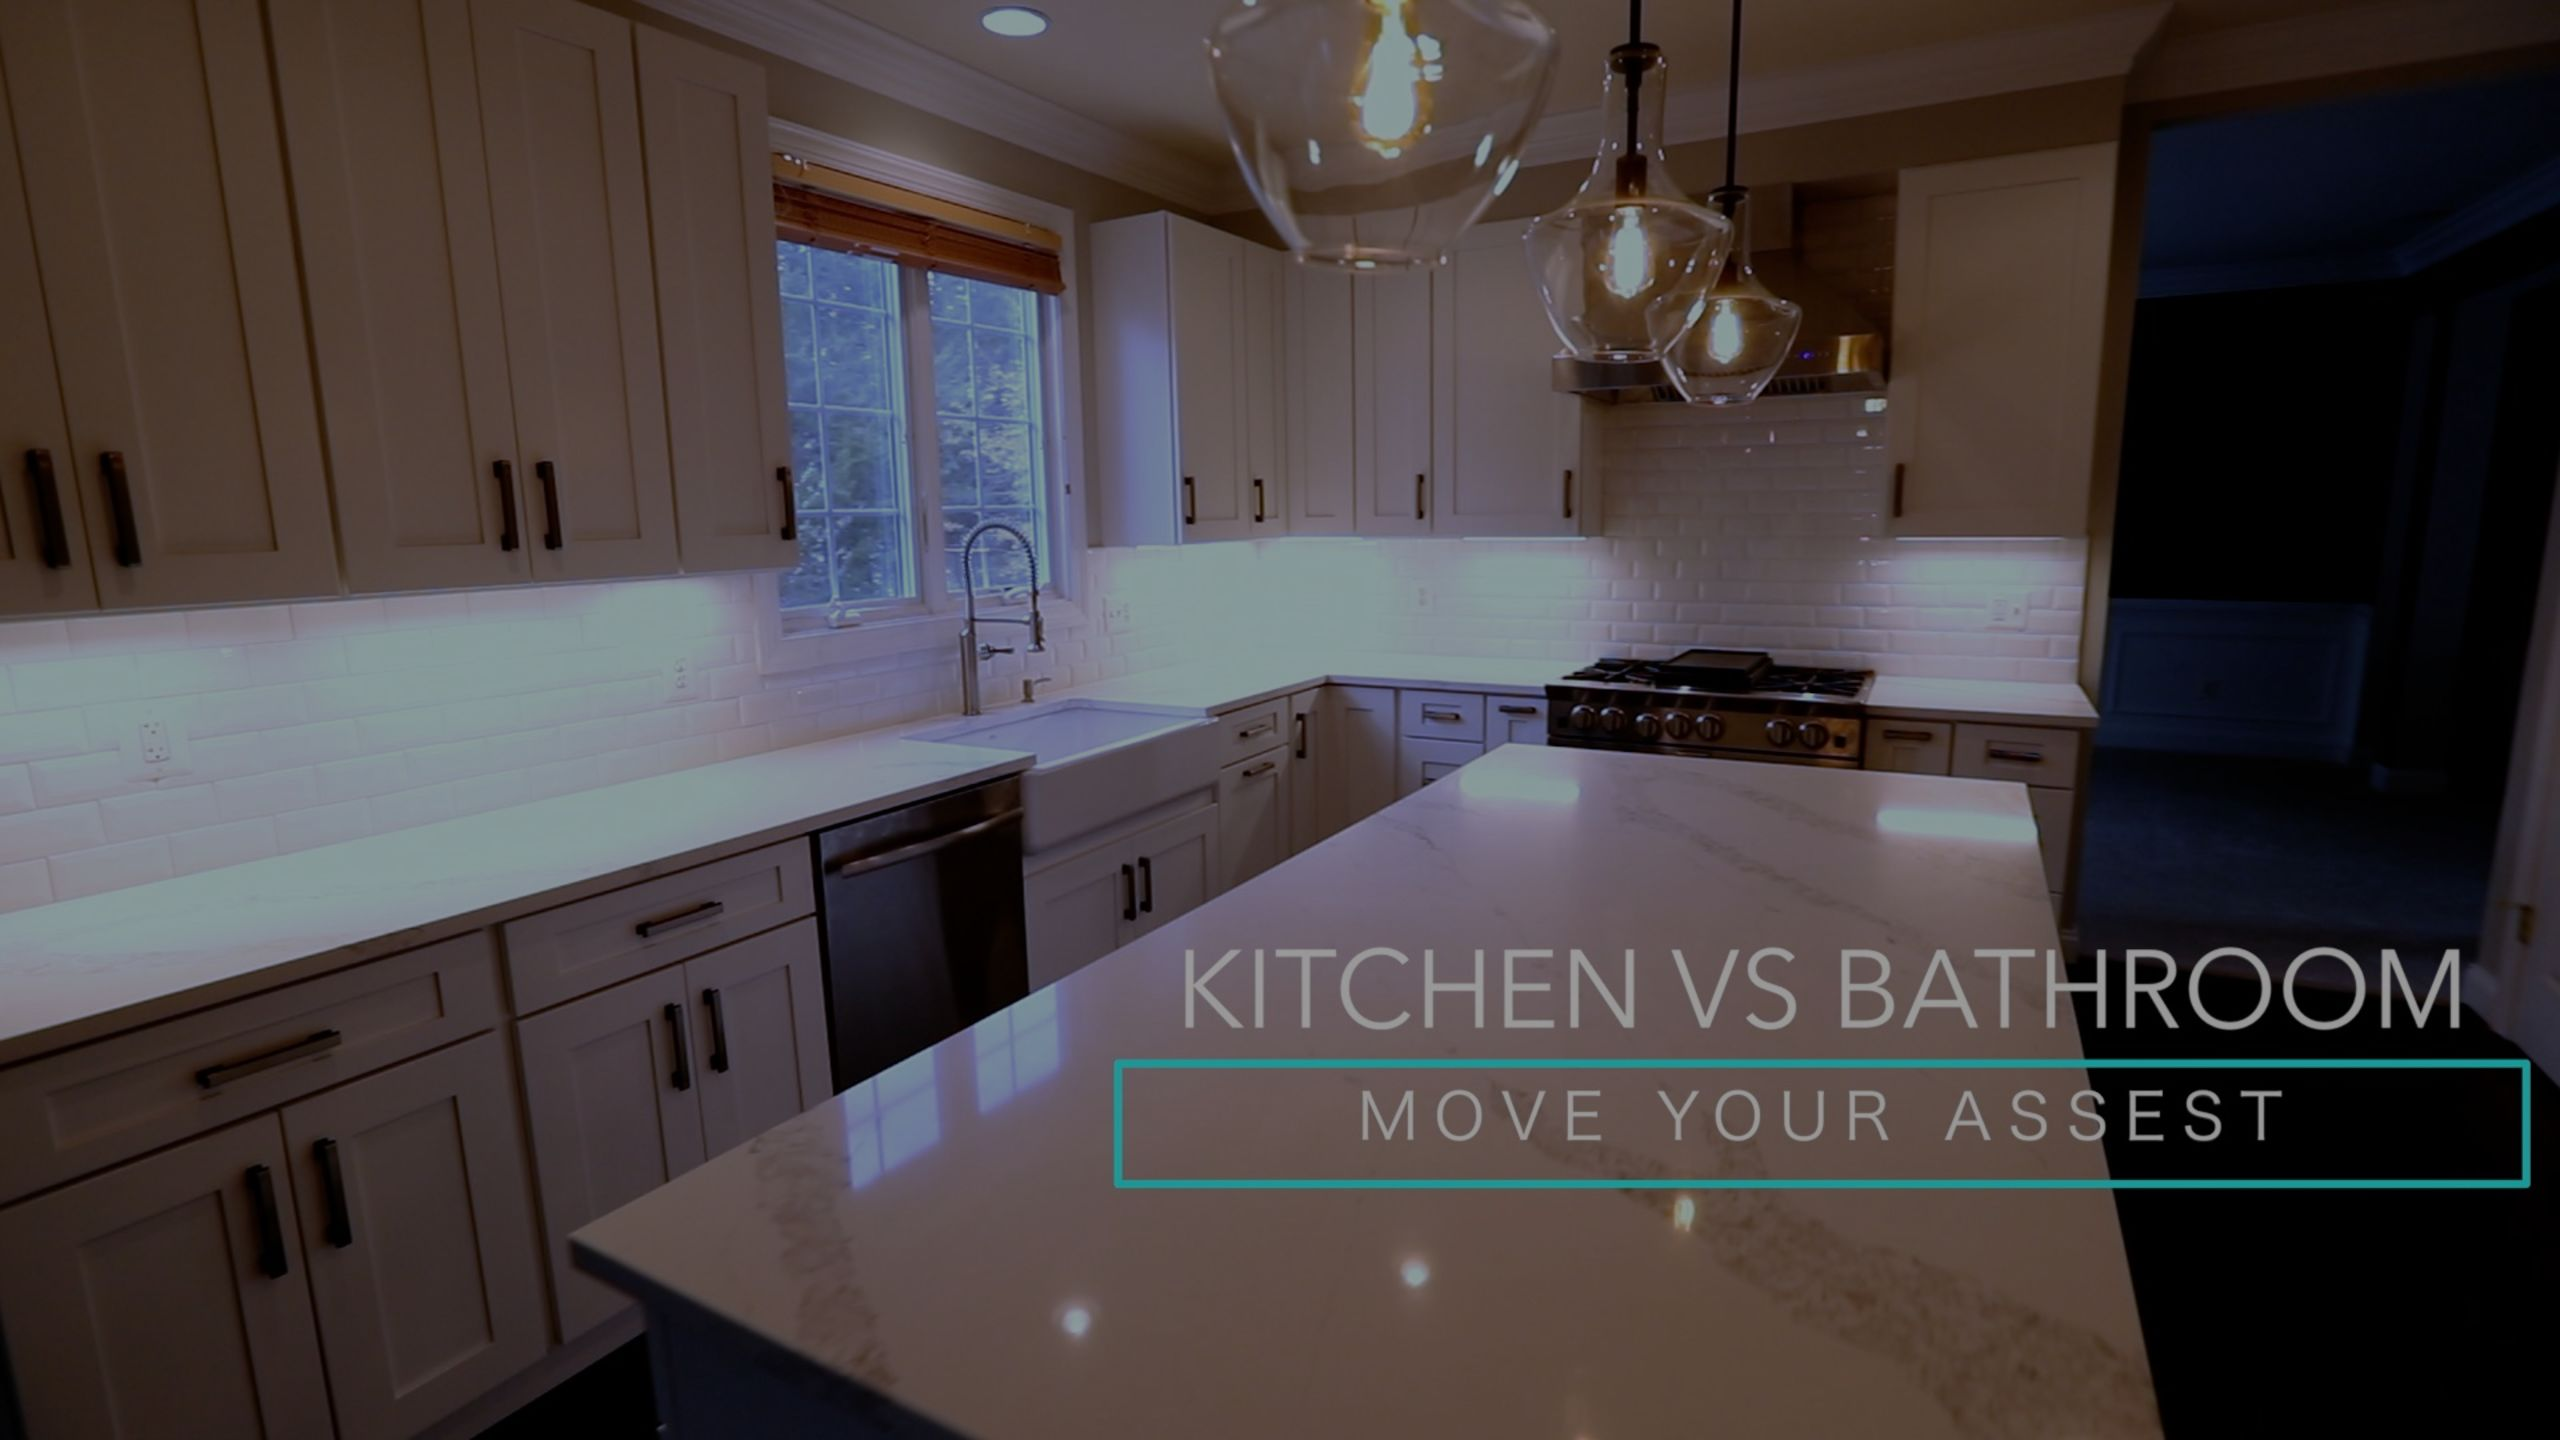 Updating Kitchen vs Bathroom